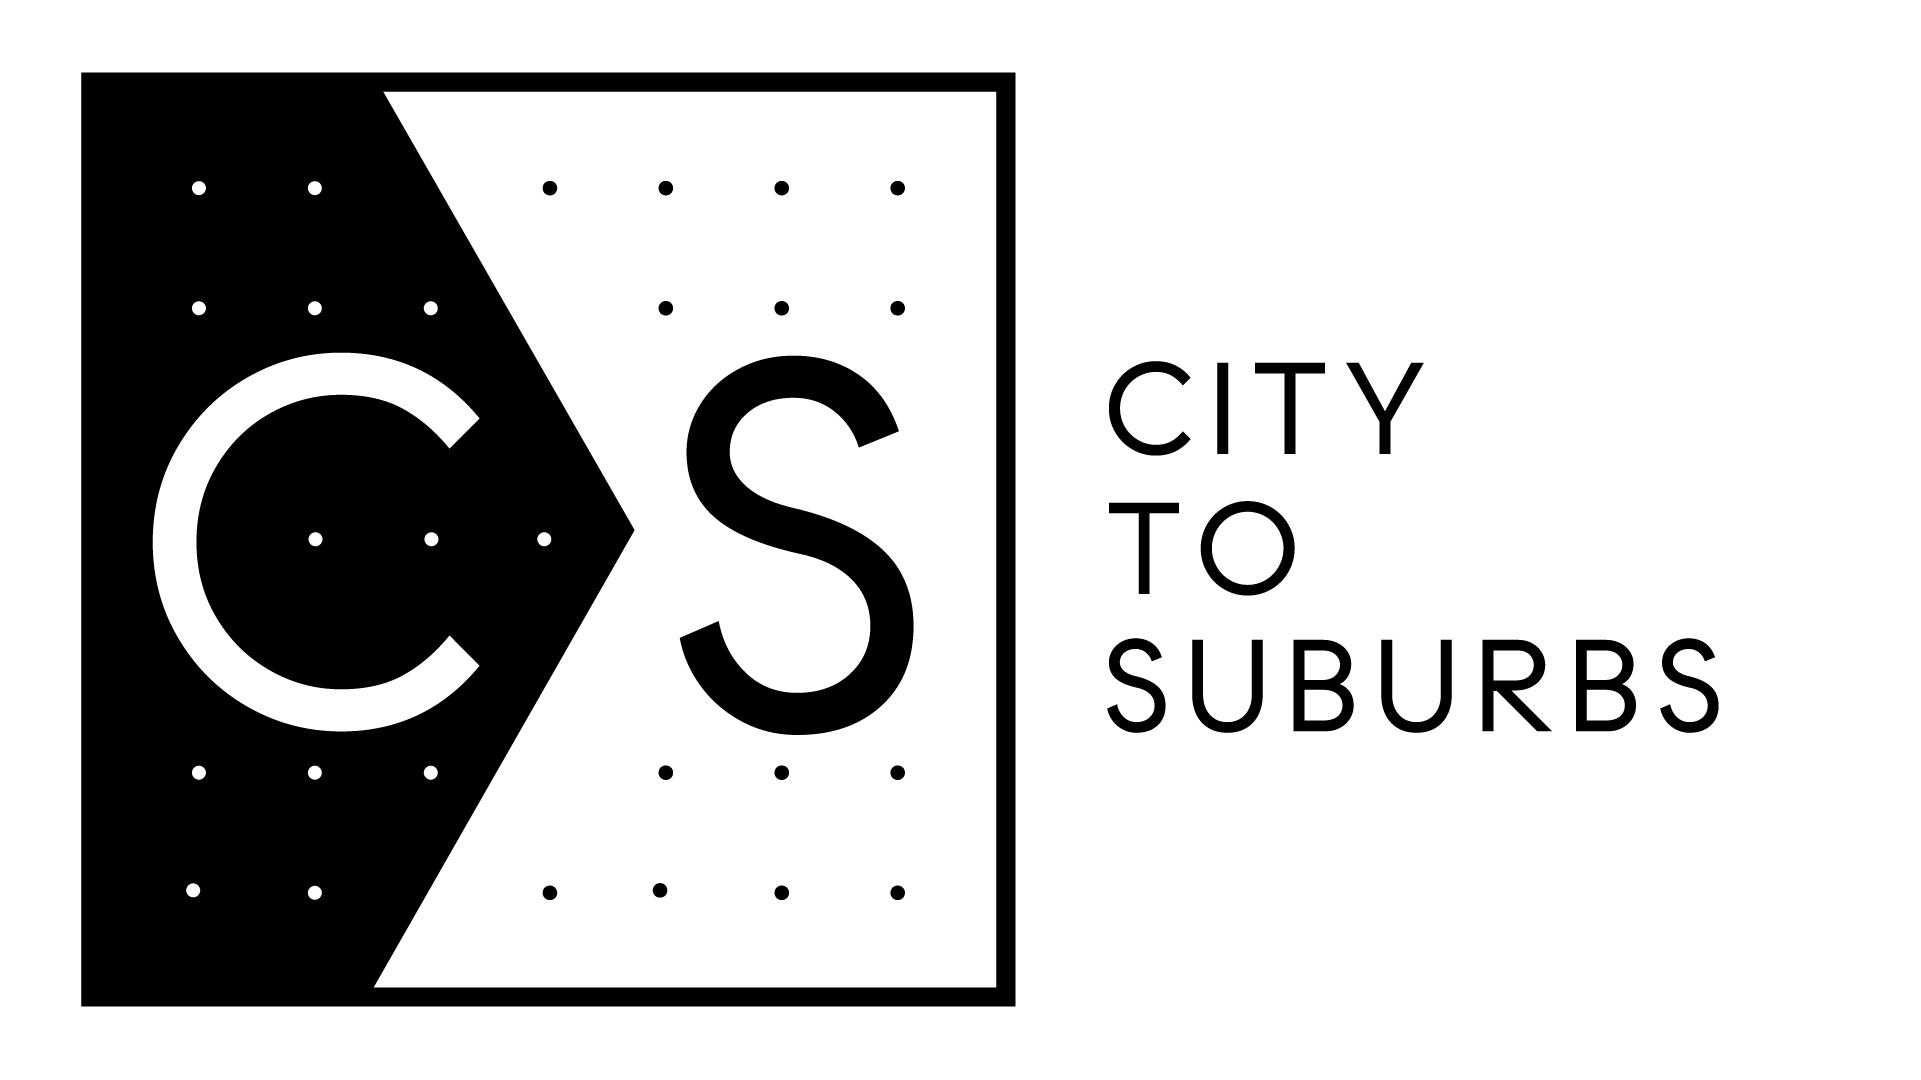 2019_03_City_To_Suburbs_Final_Monogram+Type_Alt_Blk.jpg